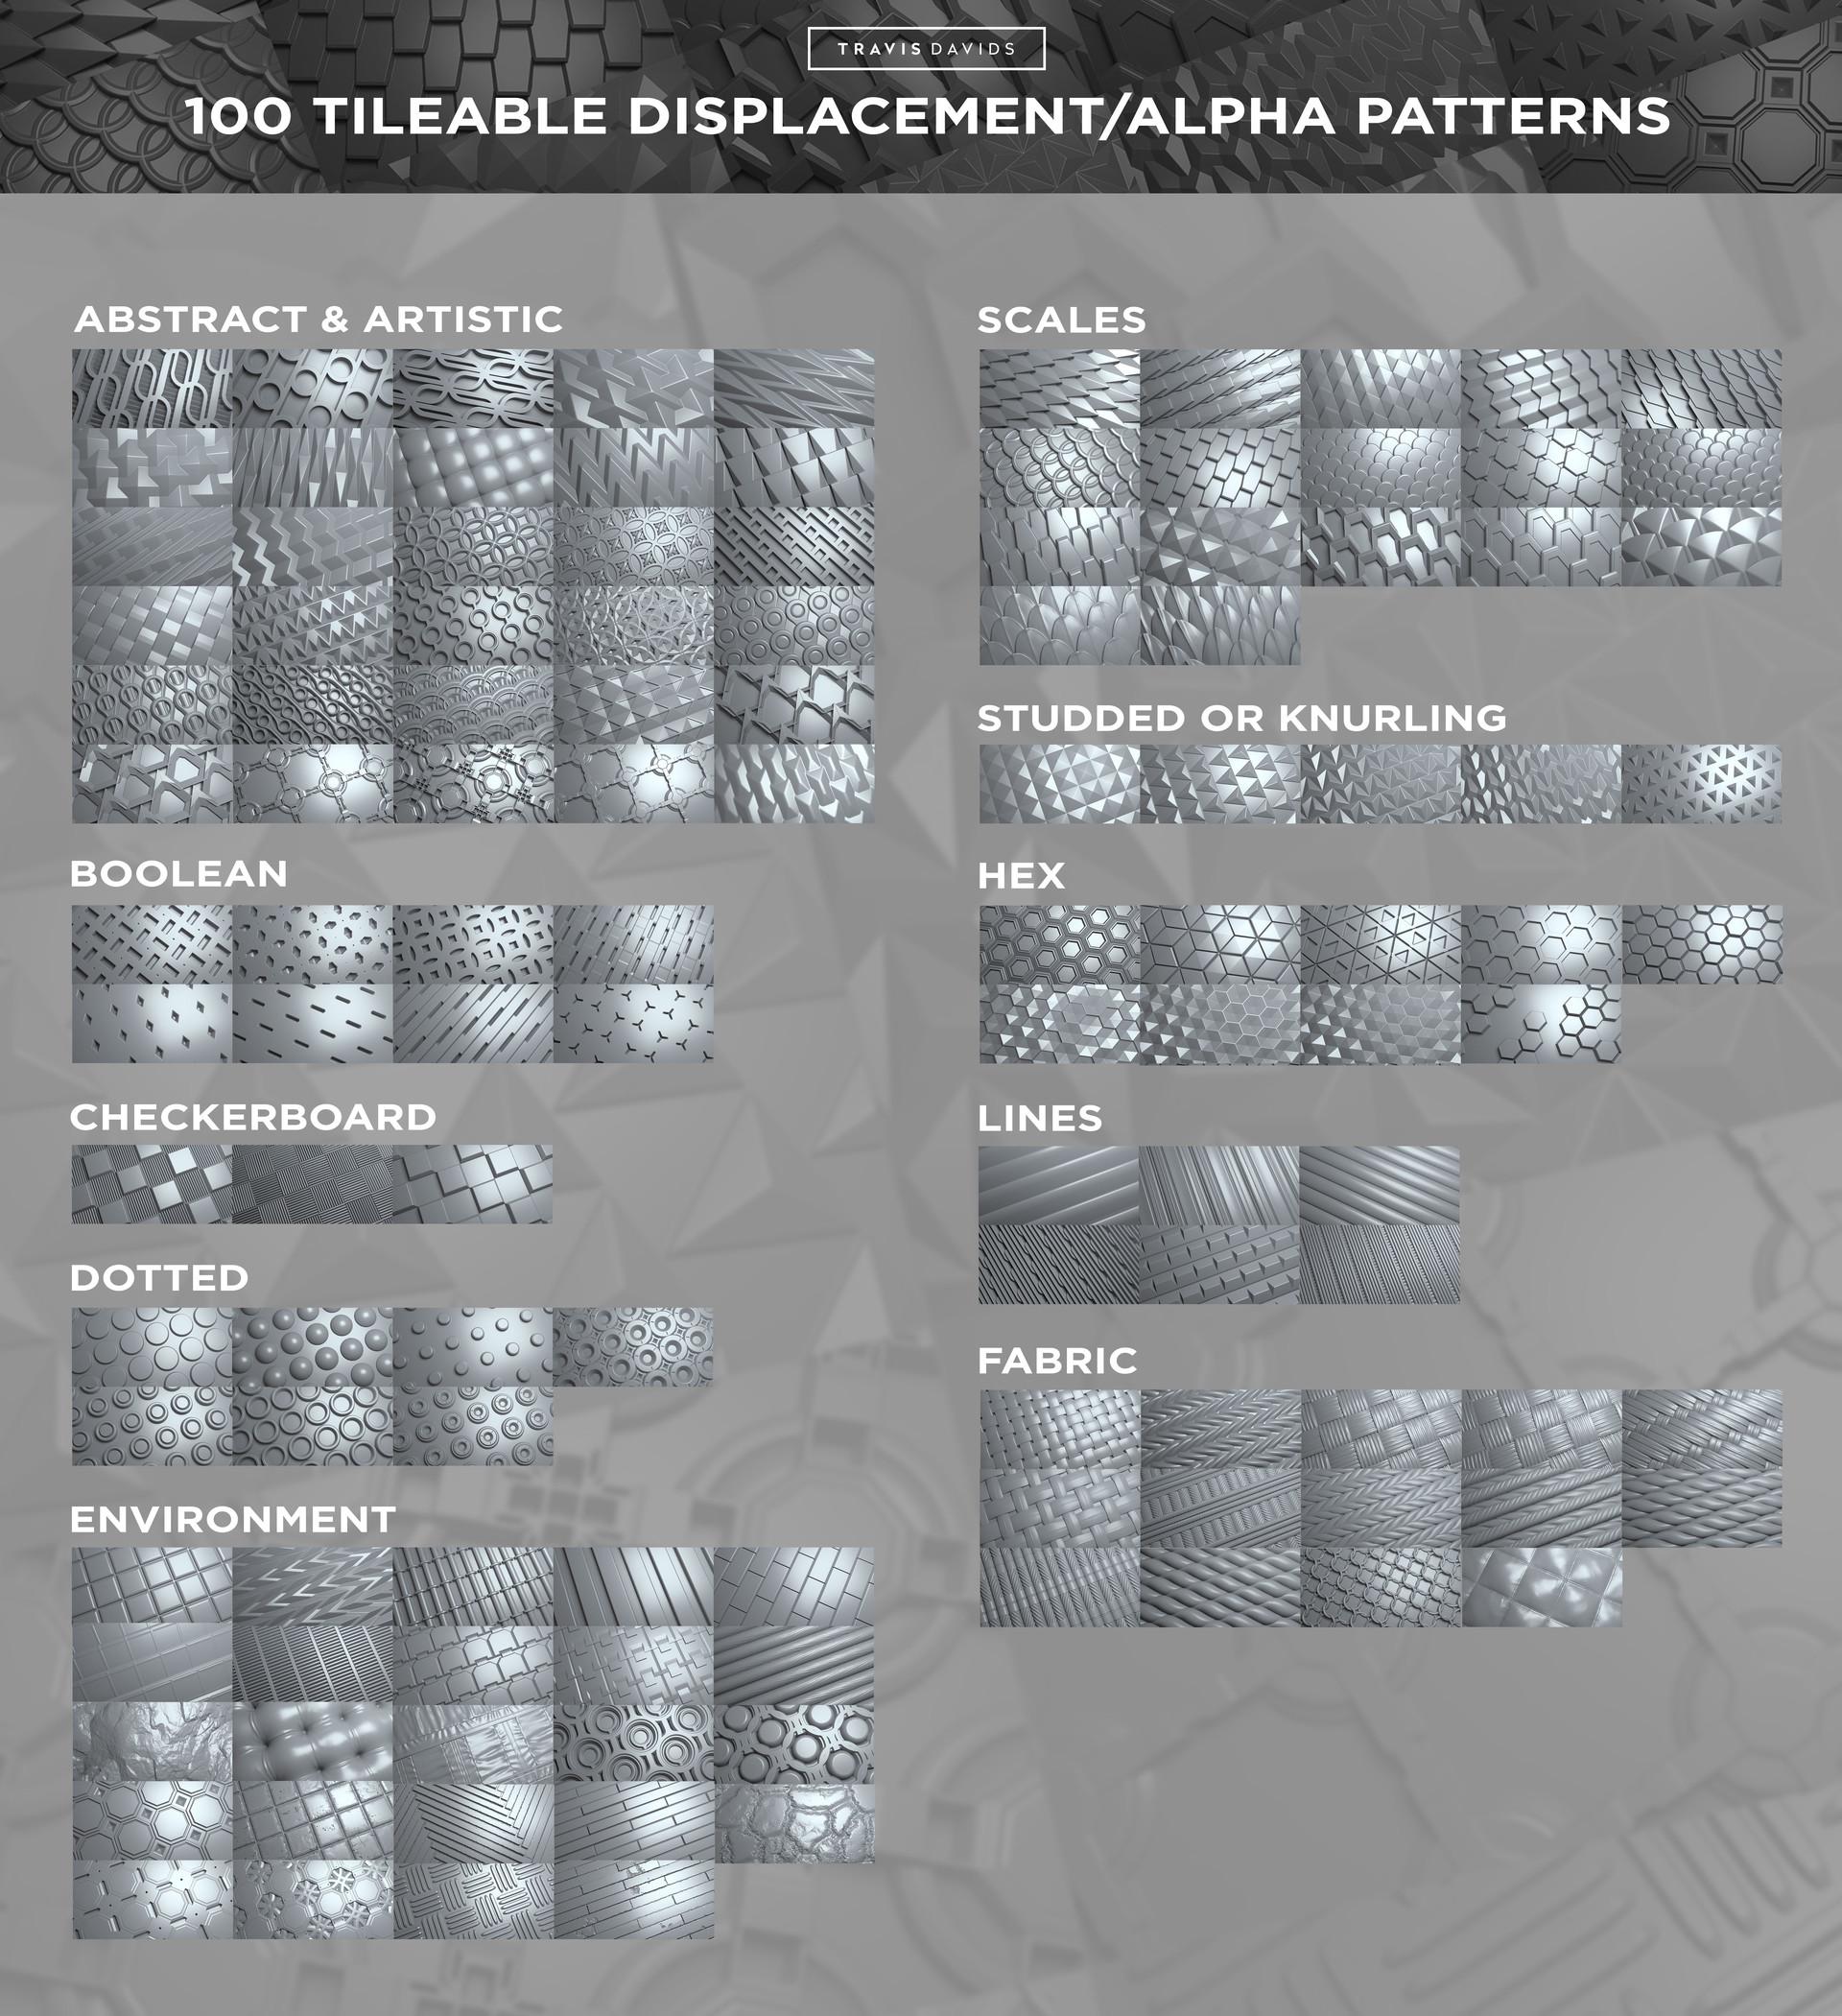 10 Categories Of Displacement